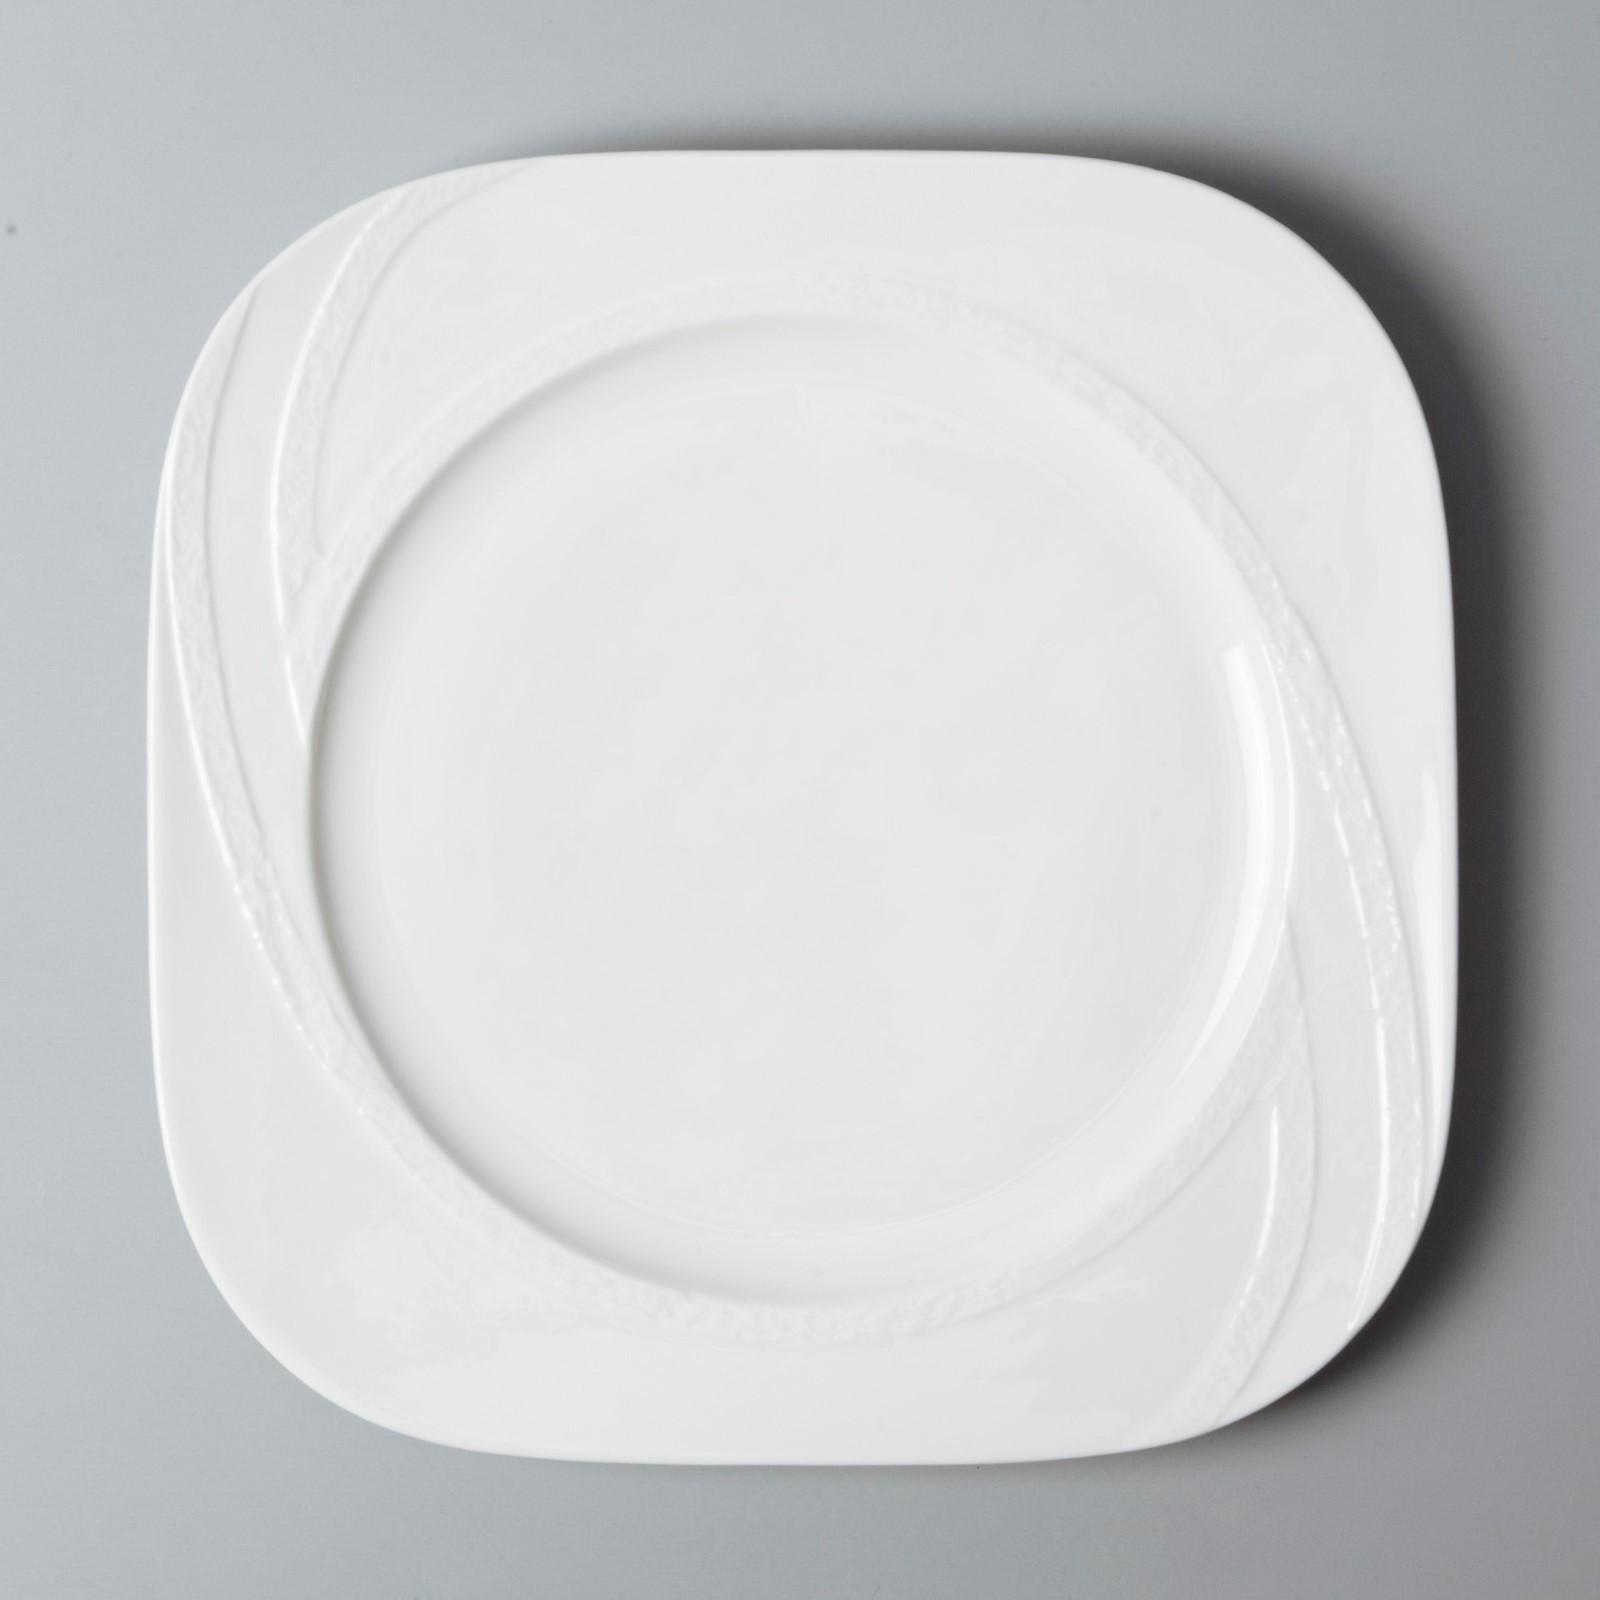 Latest best porcelain dinnerware in the world manufacturers for restaurant